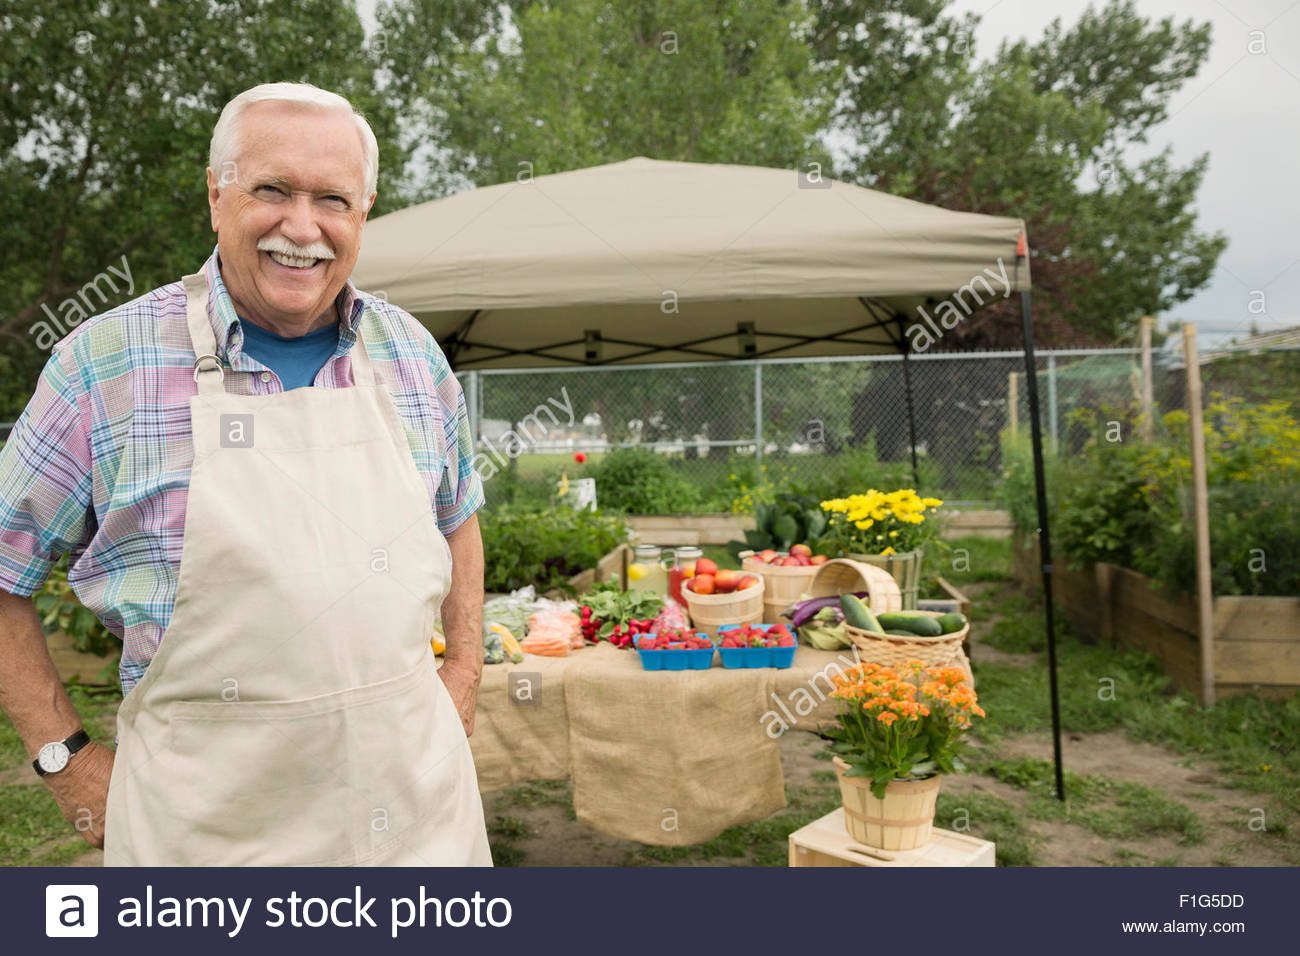 Portrait confident farmer at farmers market stall - Stock Image